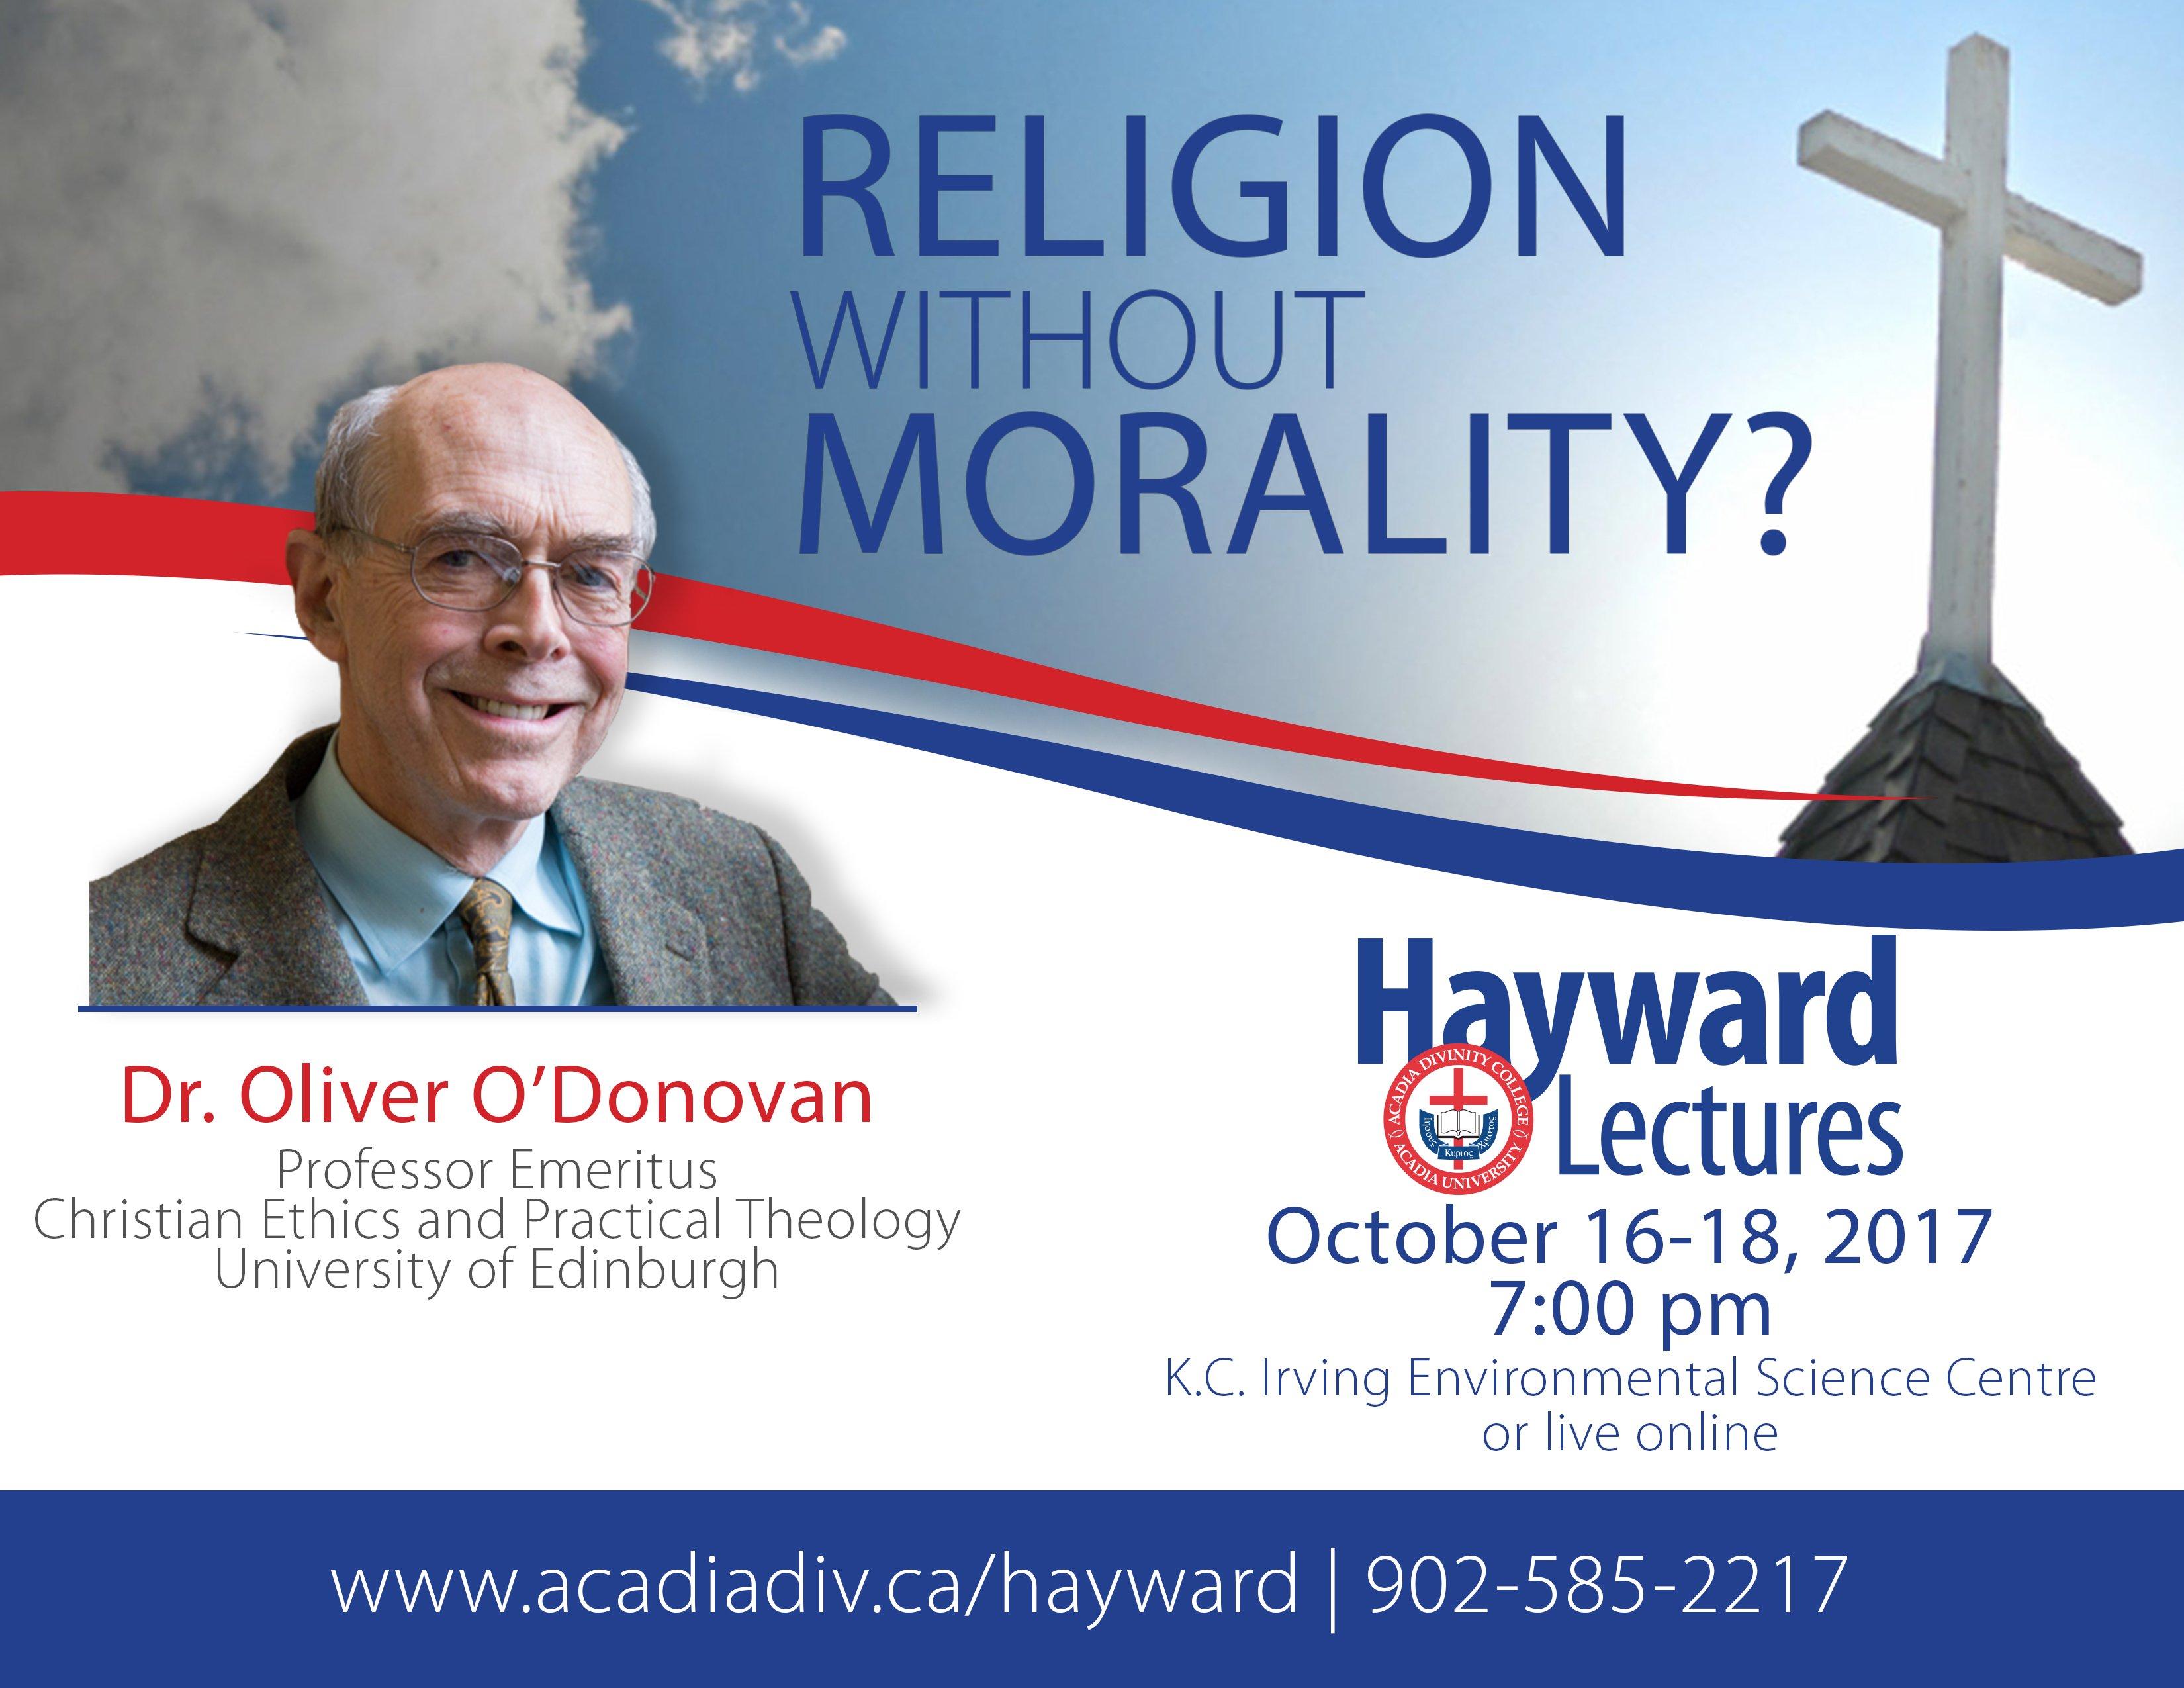 Hayward Lectures 2017